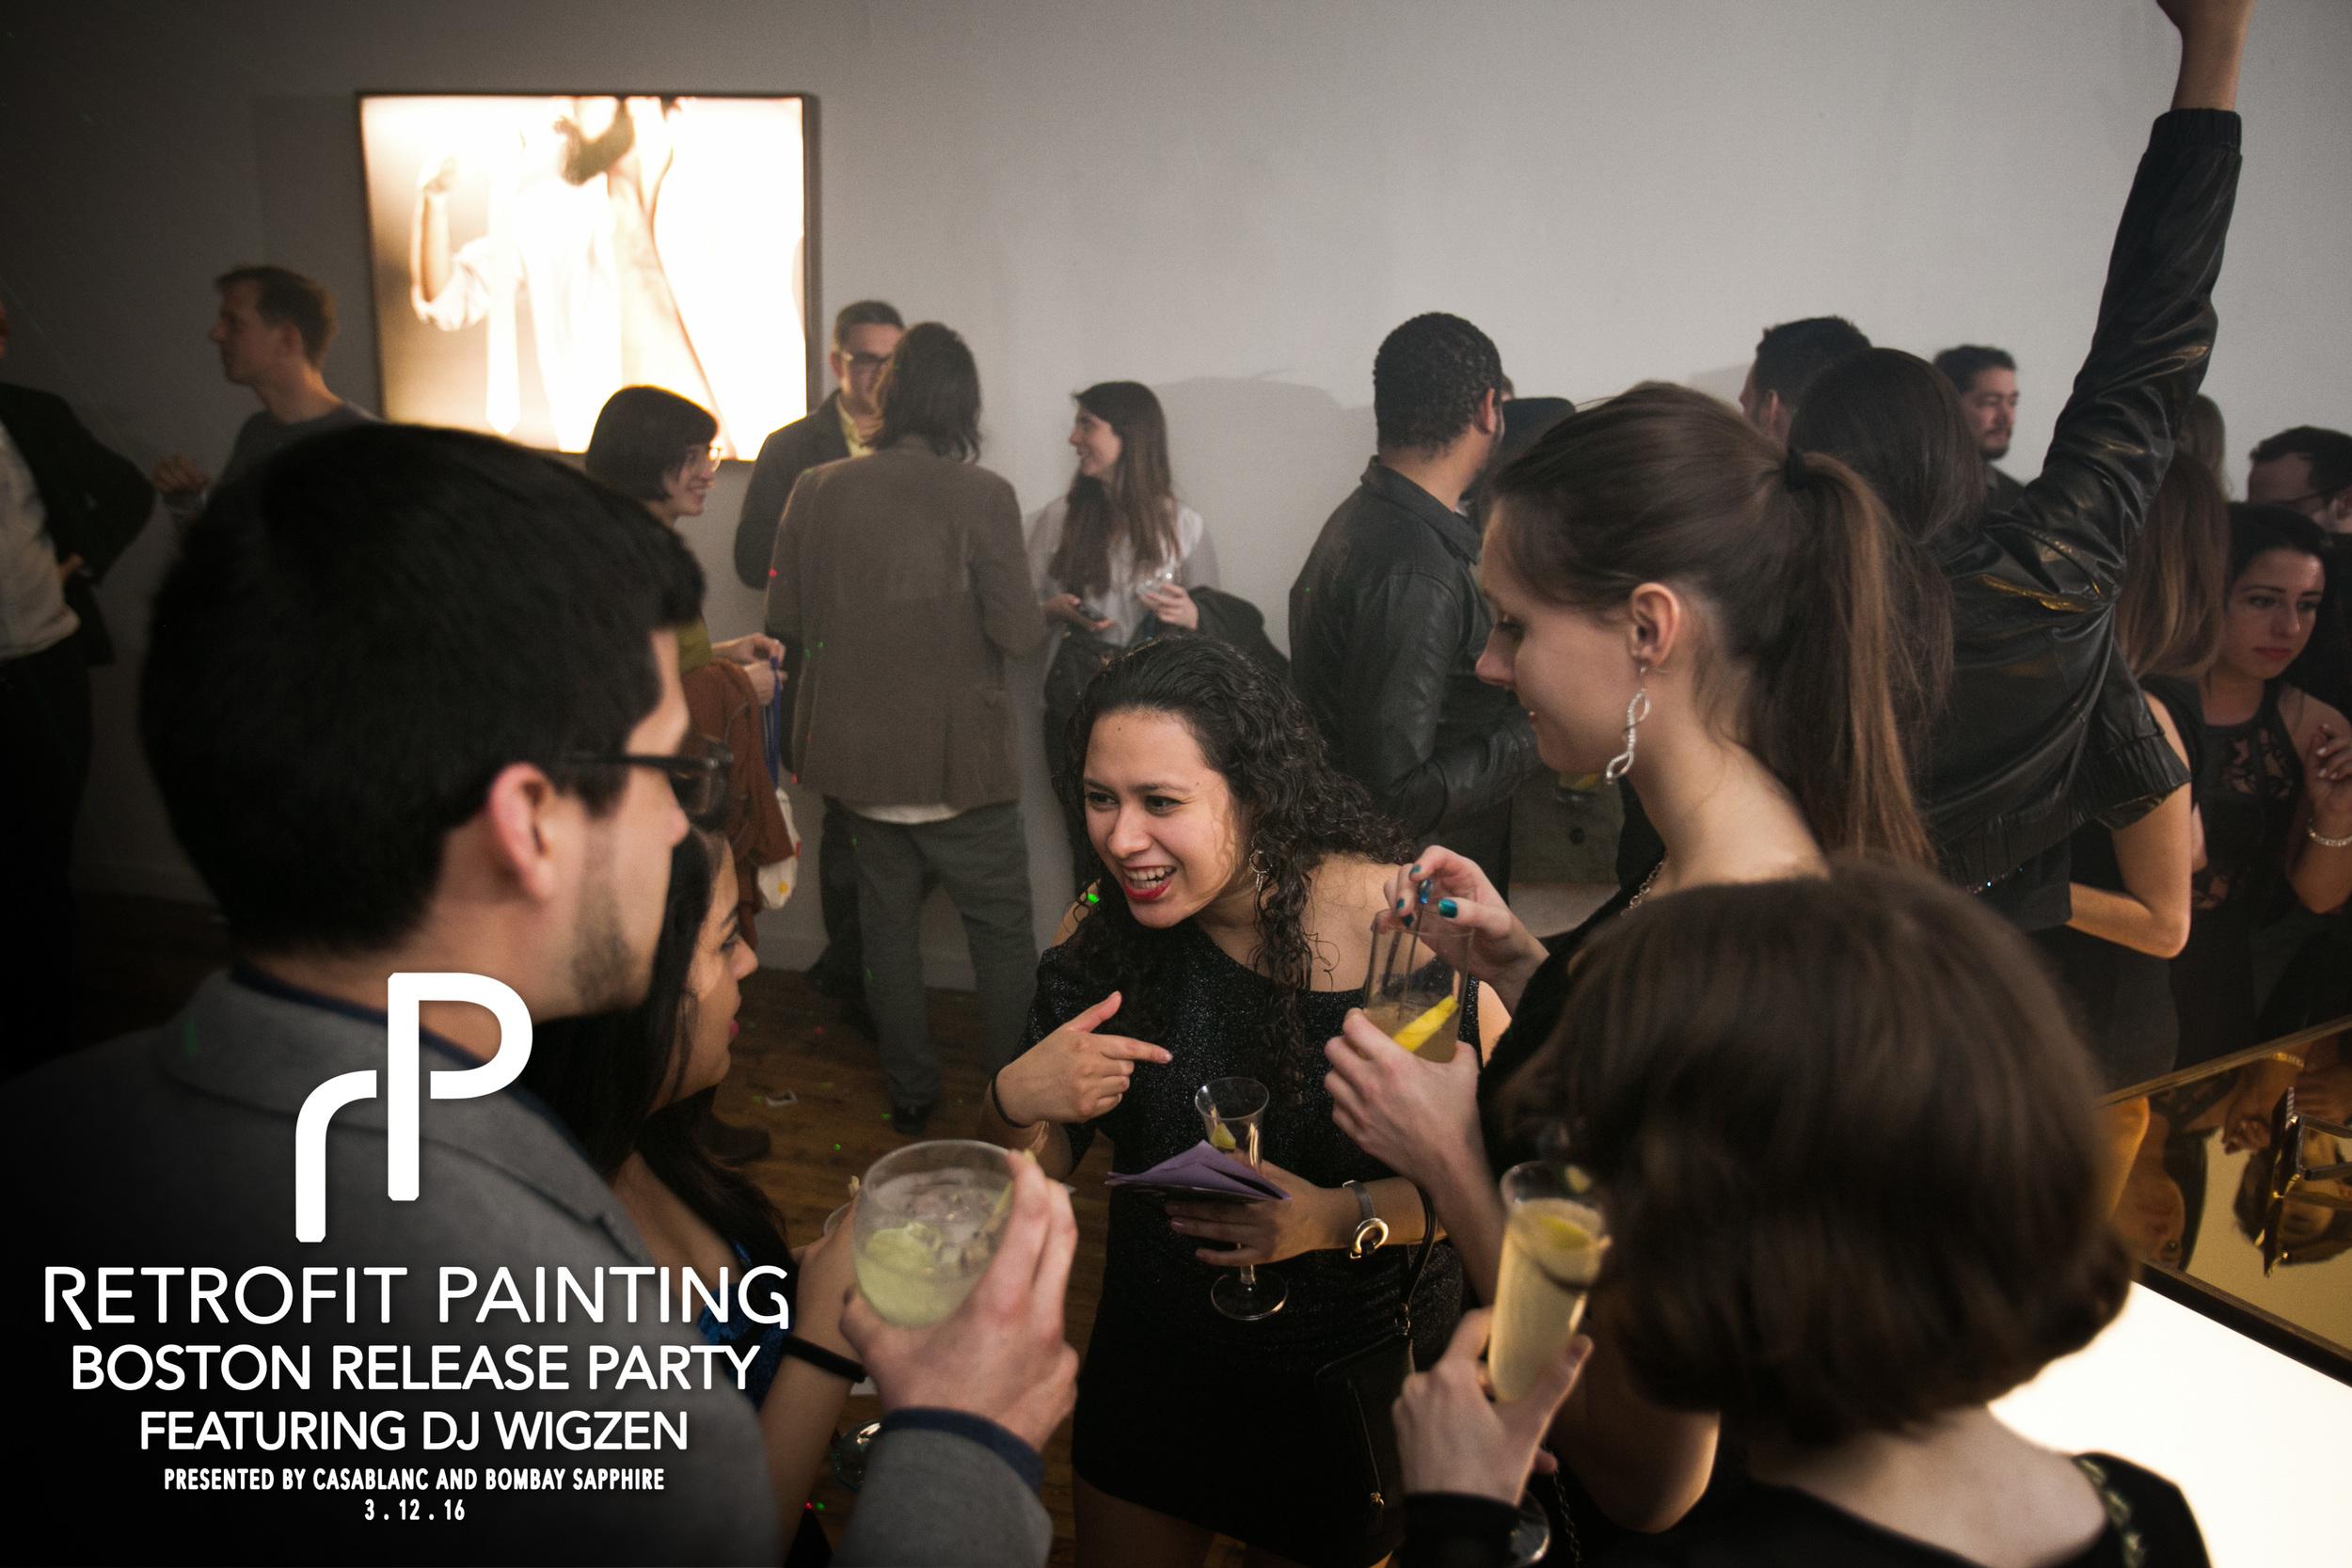 Retrofit Painting Boston Release Party 0171.jpg